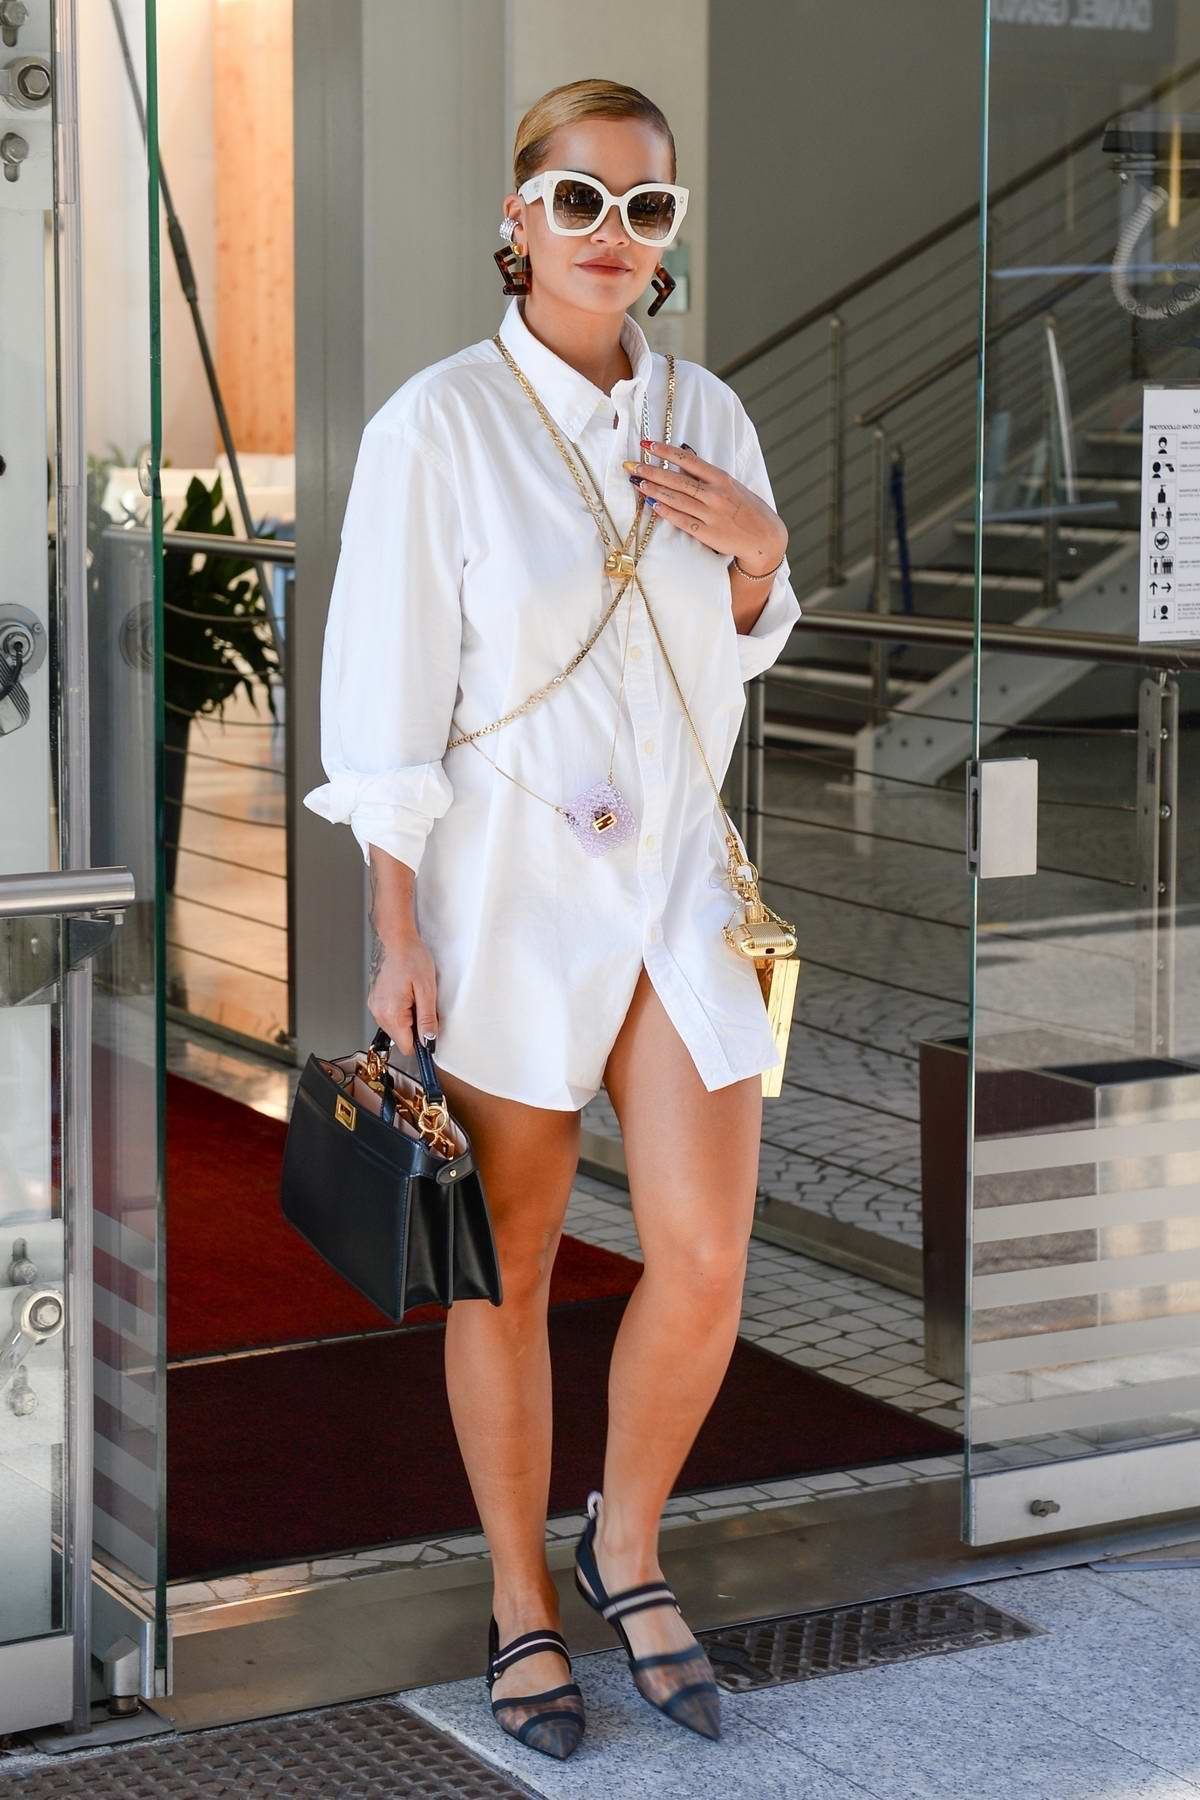 Rita Ora looks chic in white as she leaves her hotel during Milan Fashion Week in Milan, Italy